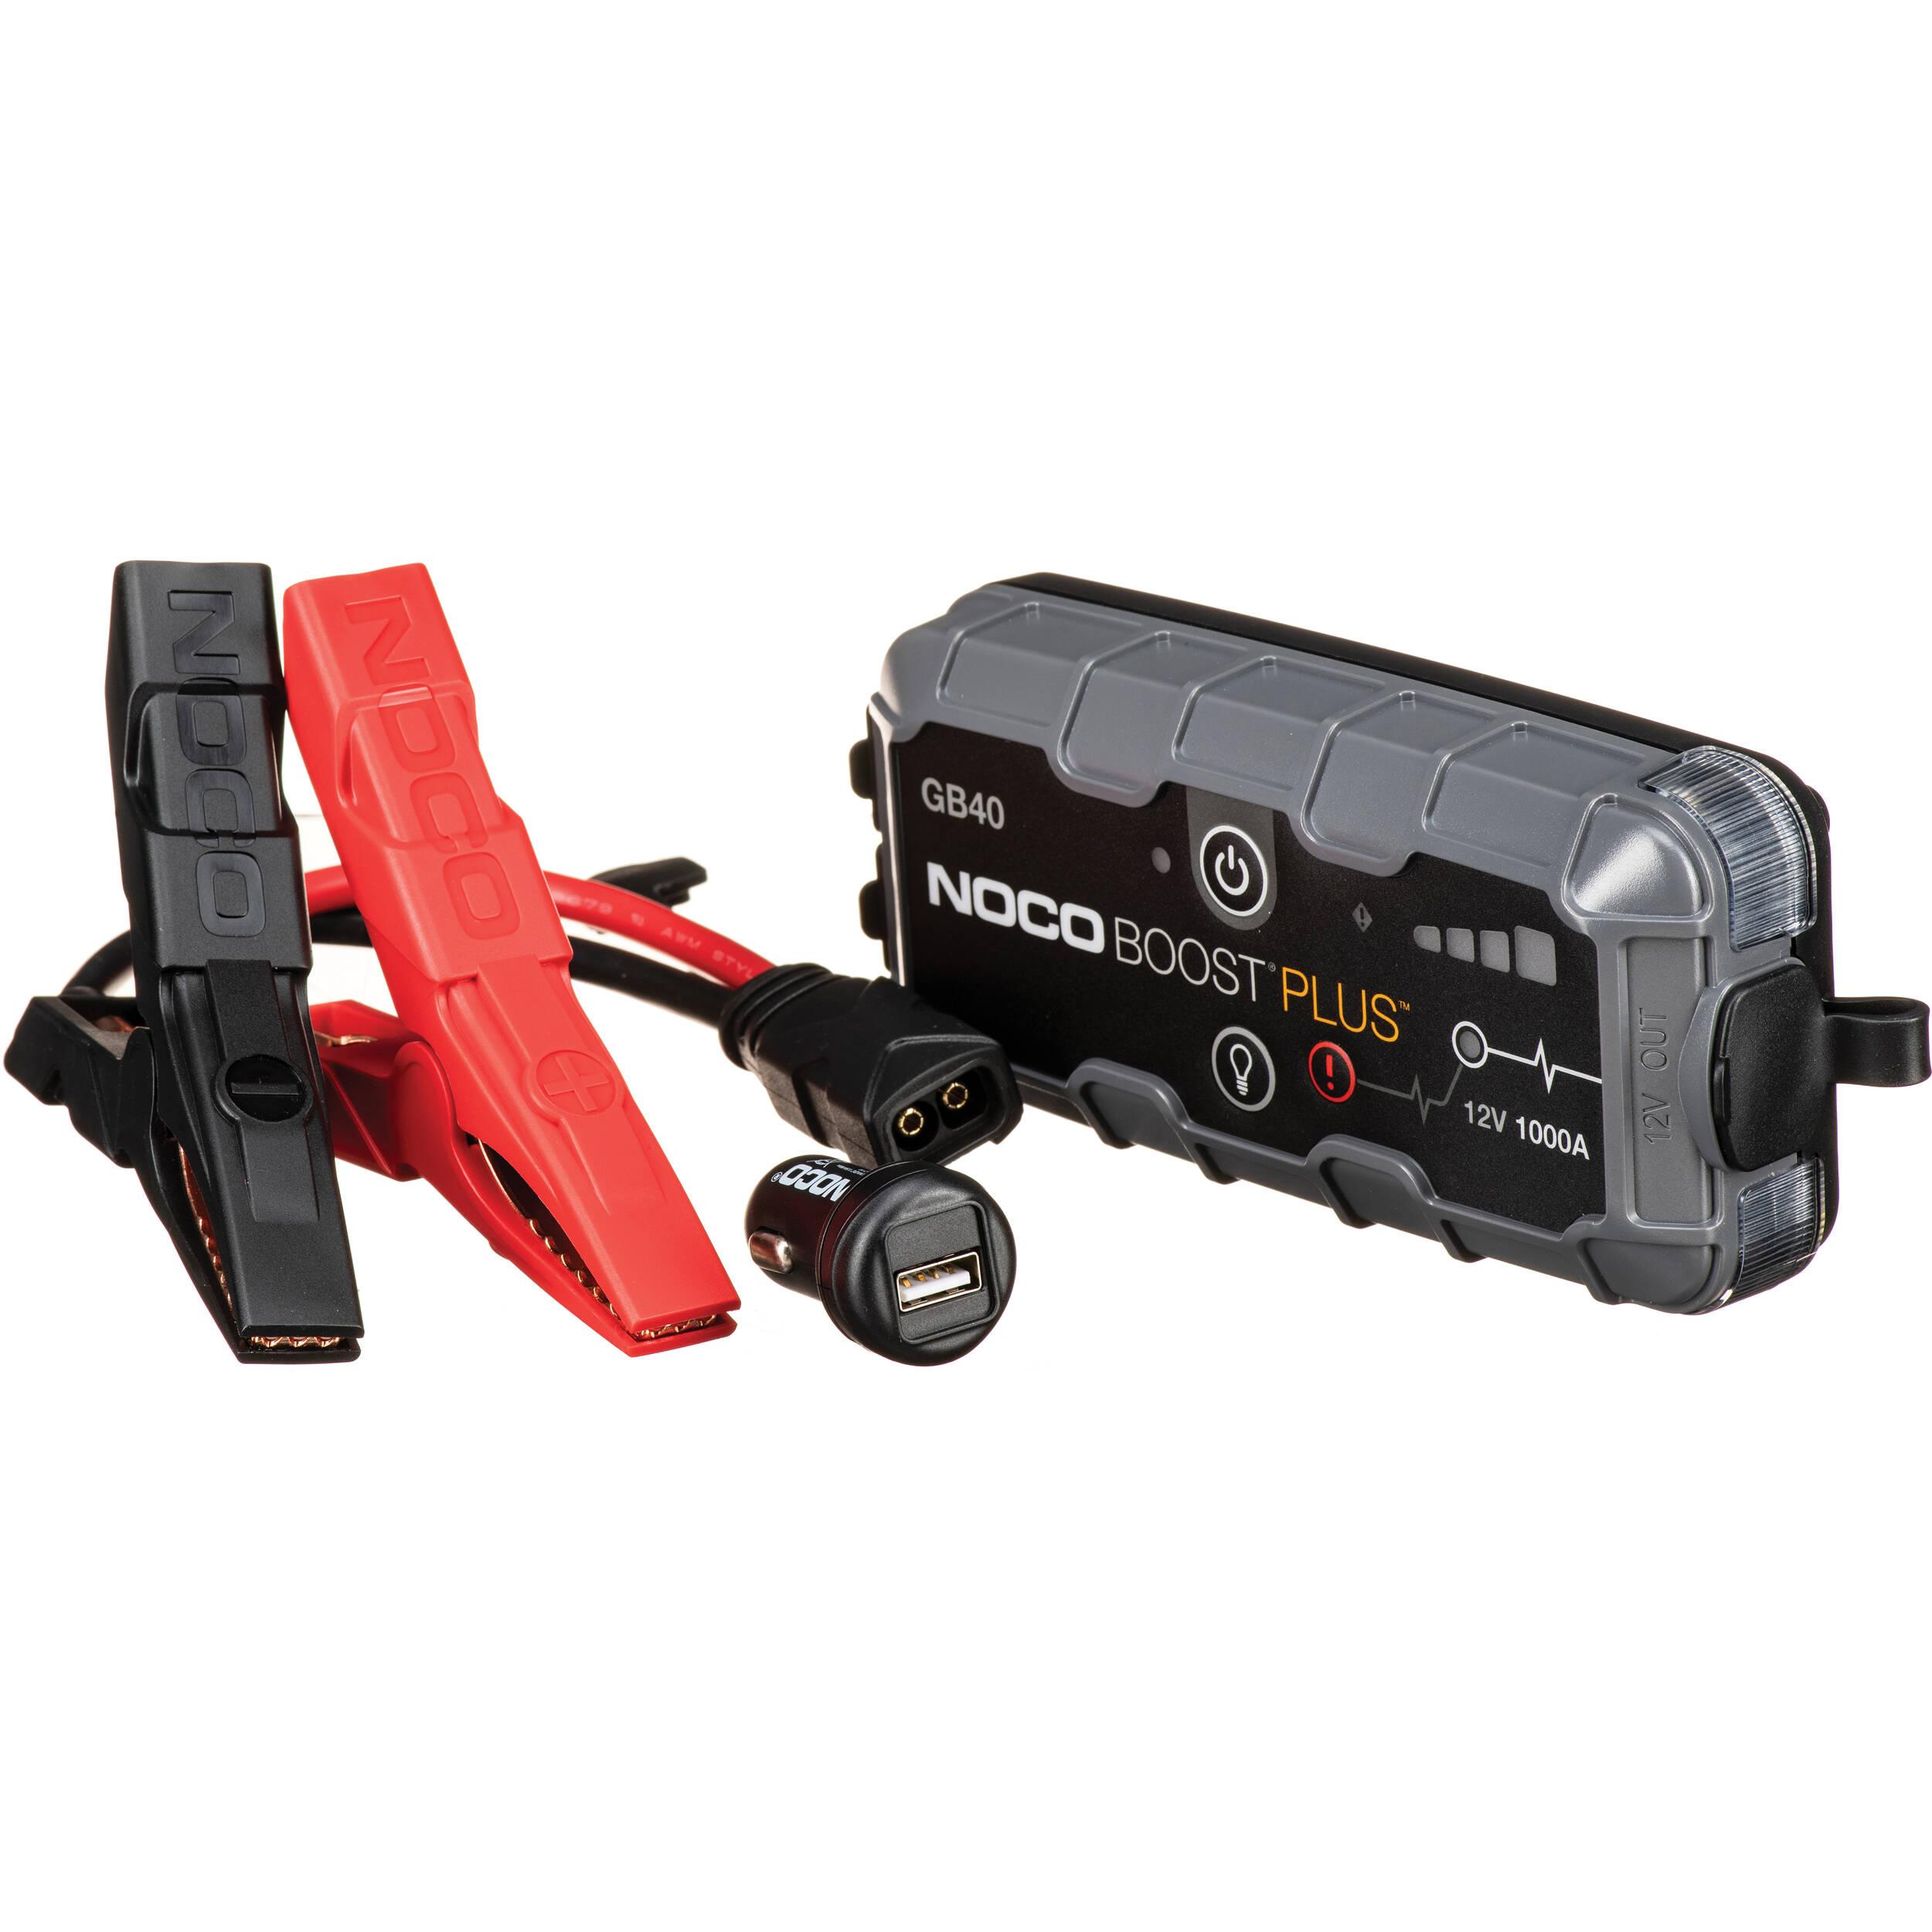 NOCO Genius Boost Plus 1000 Amp UltraSafe Jump Starter &